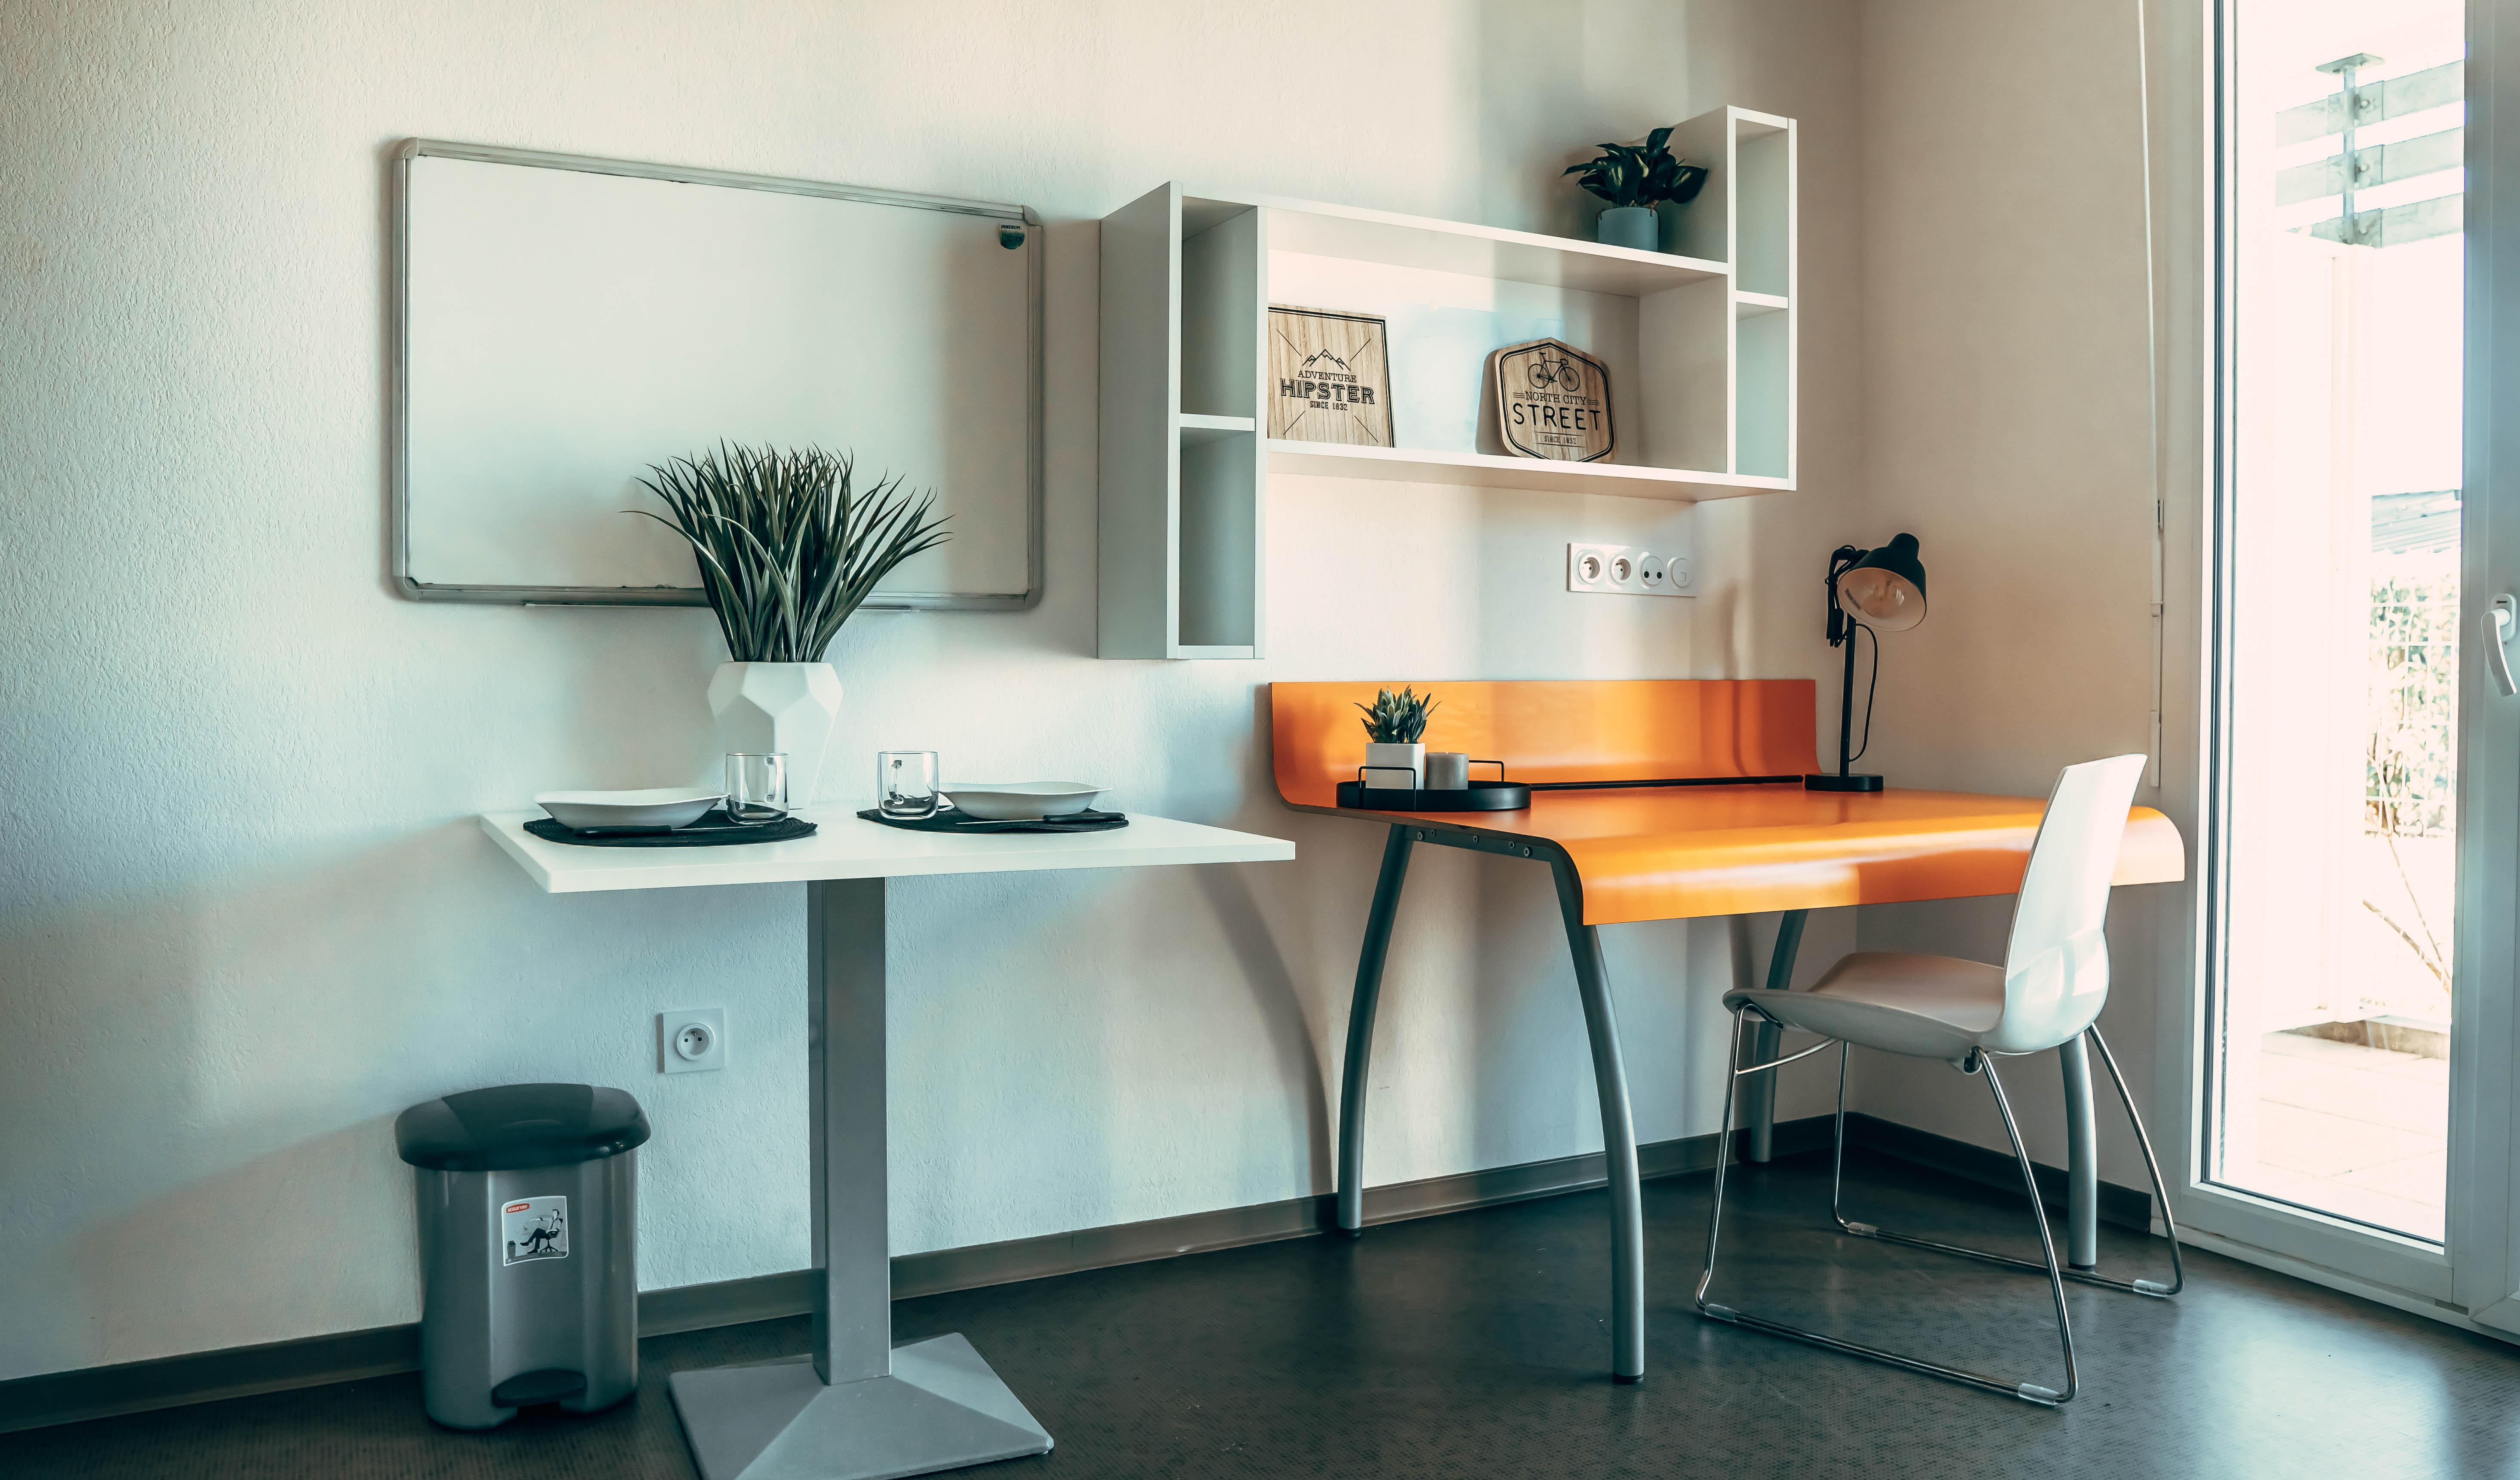 image  2020 08 27 residence etudiante suitetudes le theleme montpellier studio bureau